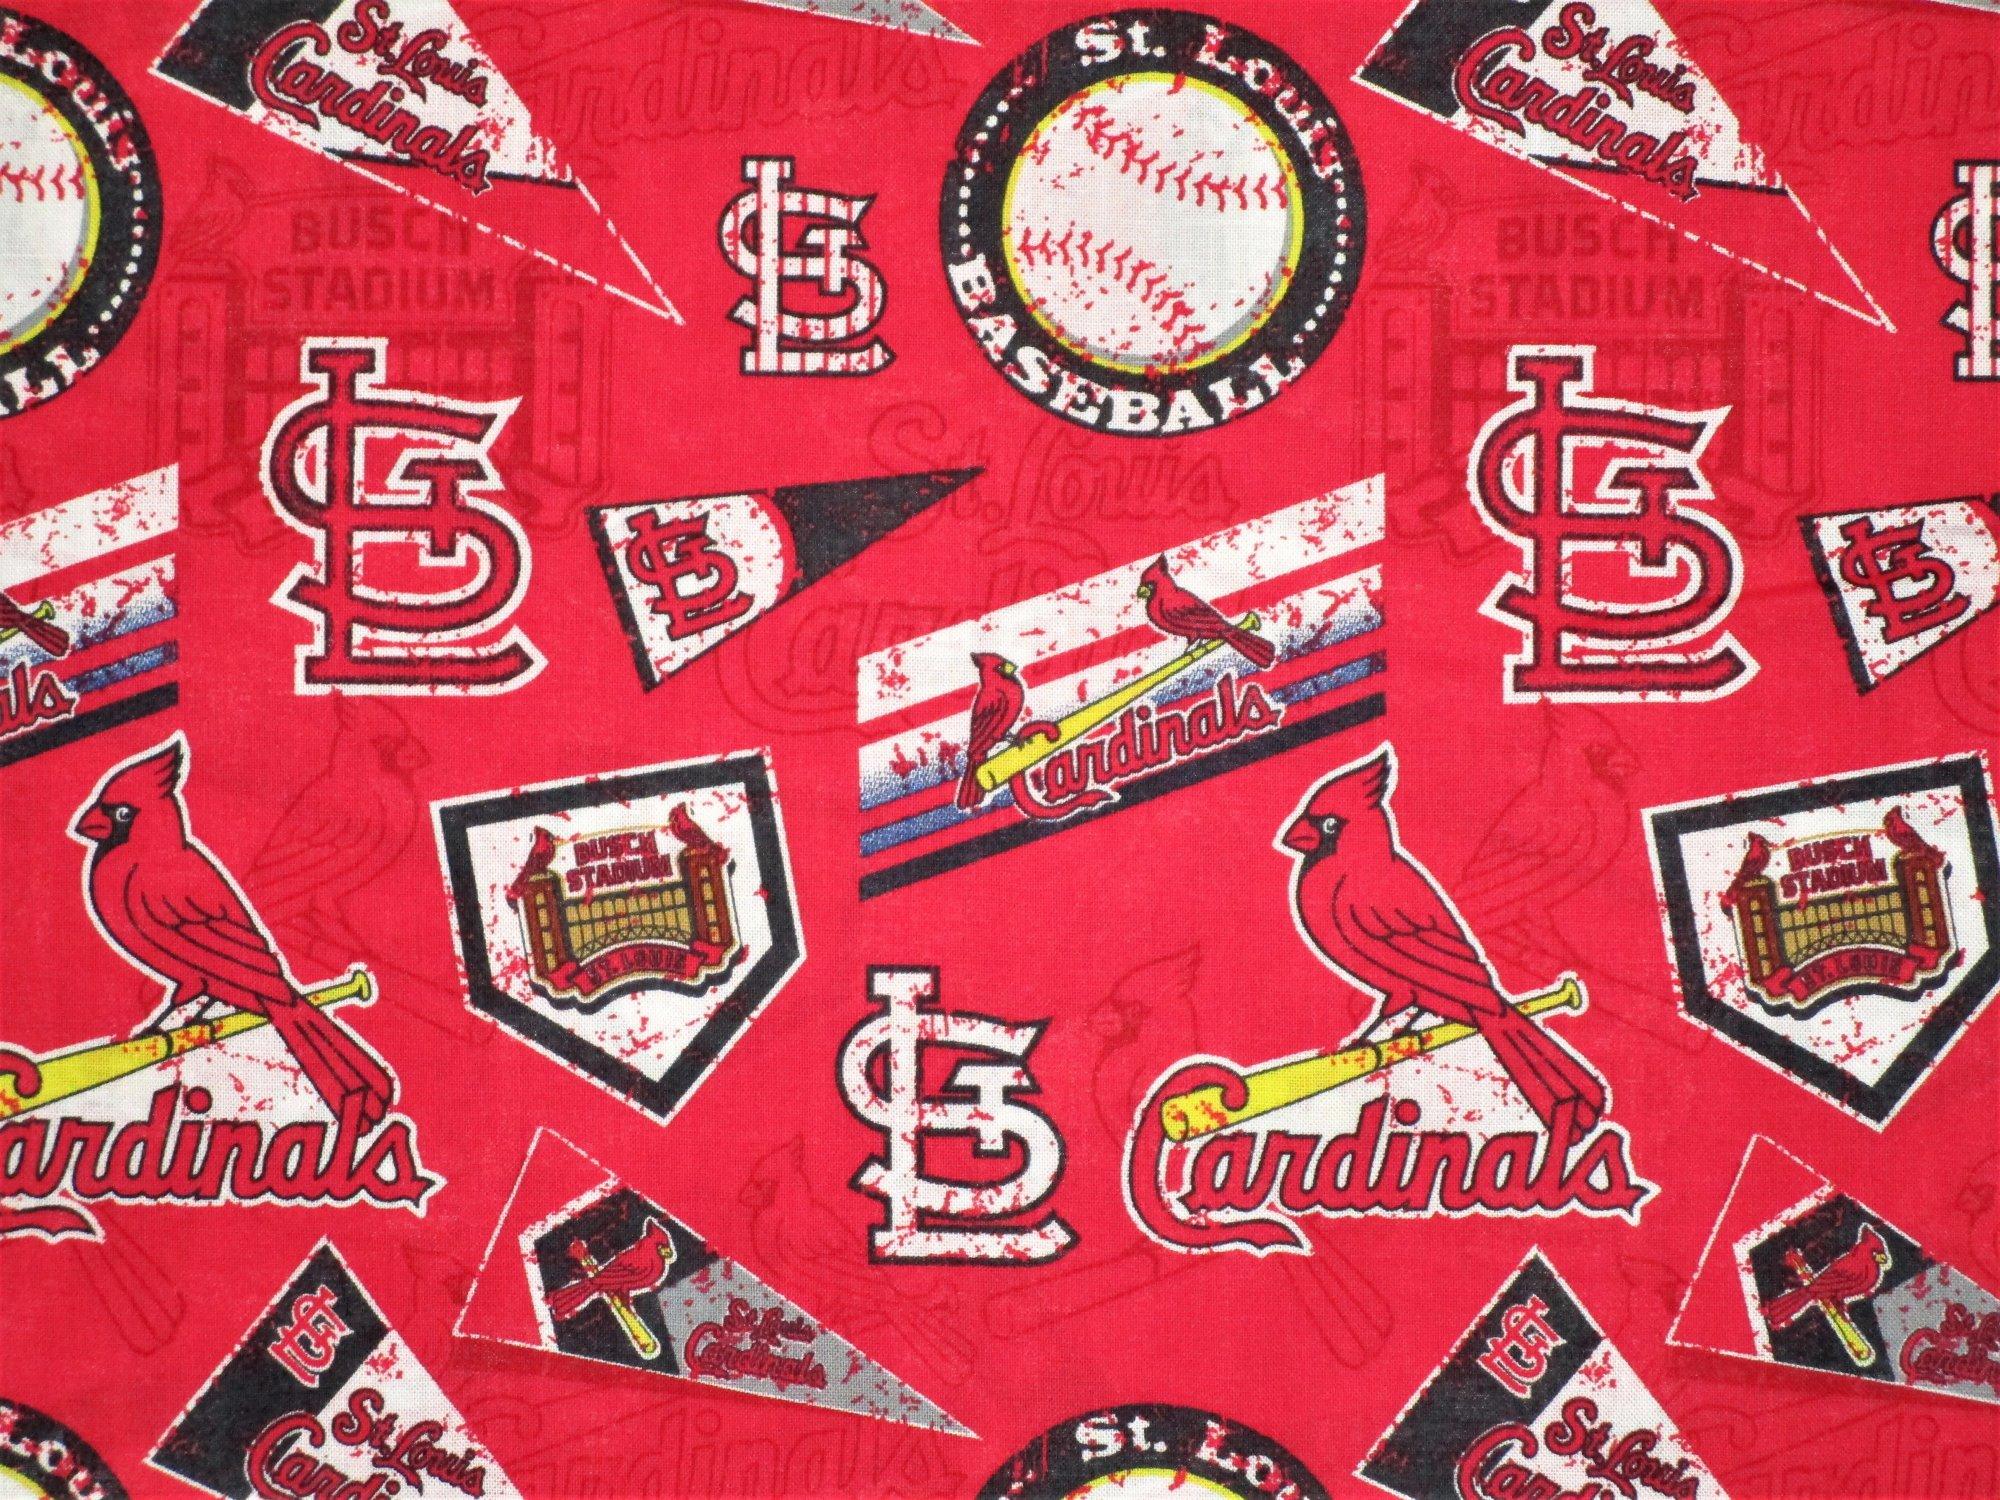 MLB St. Louis Cardinals 14433B Pennants